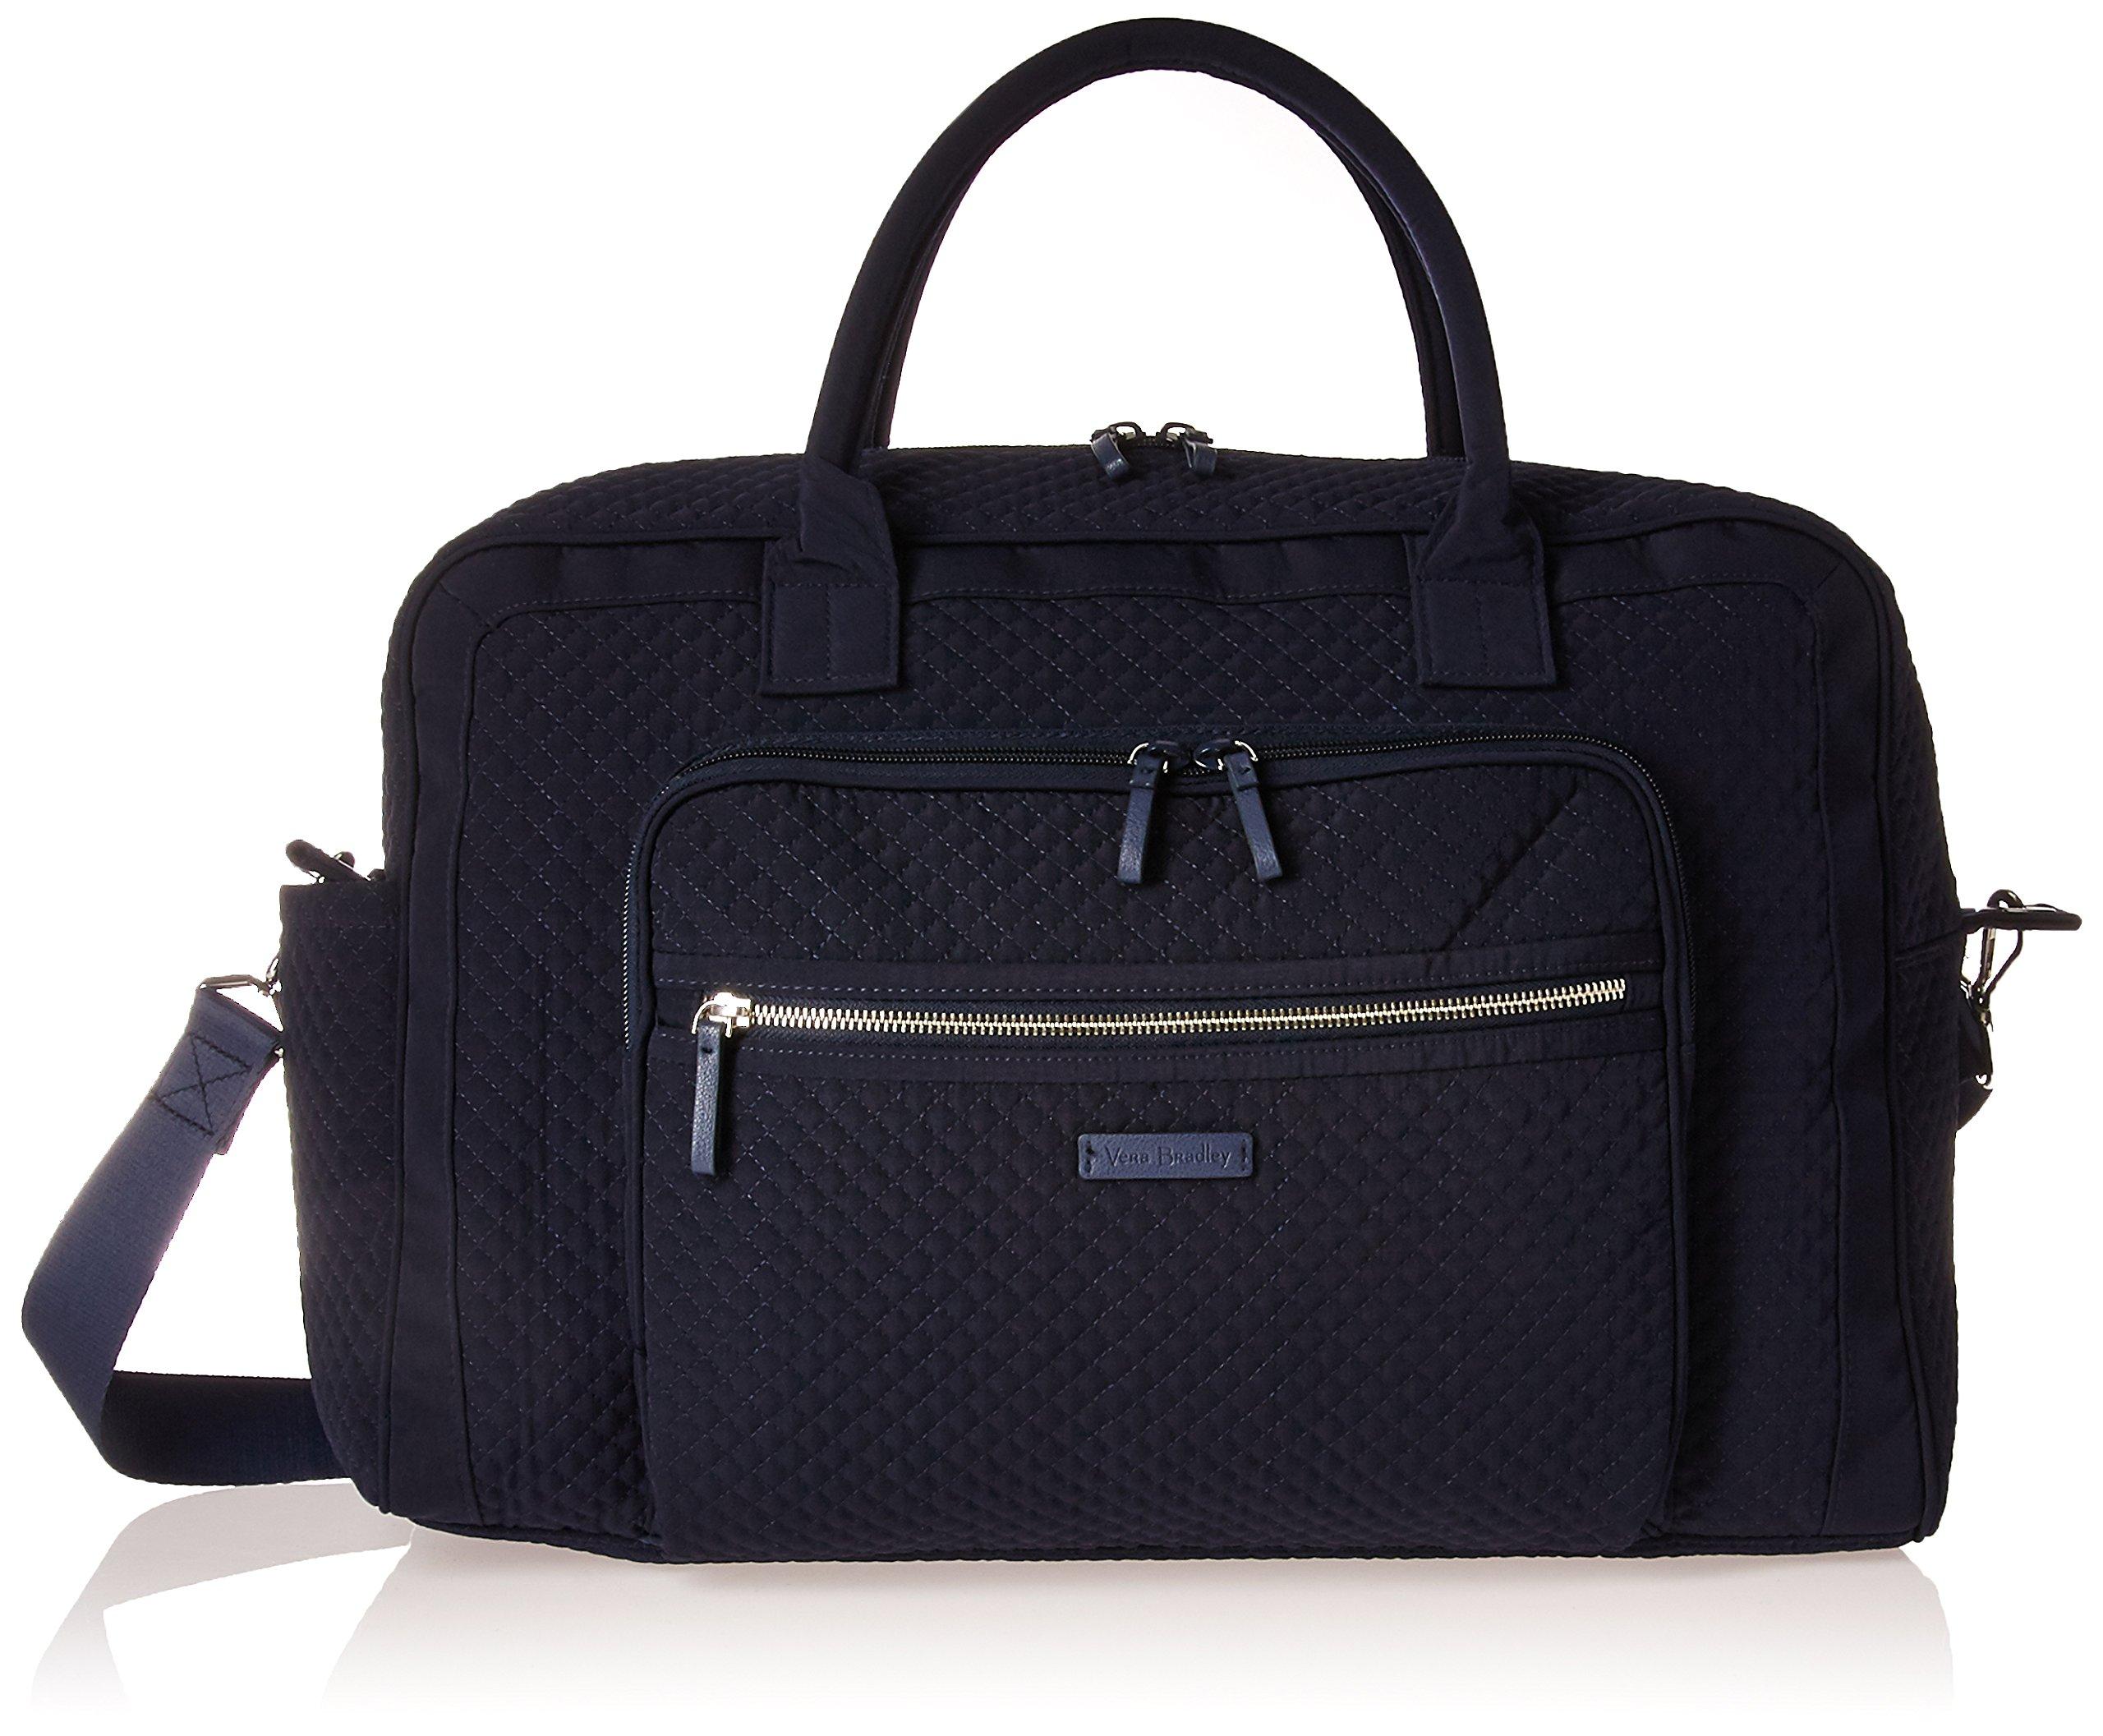 Vera Bradley Women's Iconic Weekender Travel Bag Vera by Vera Bradley